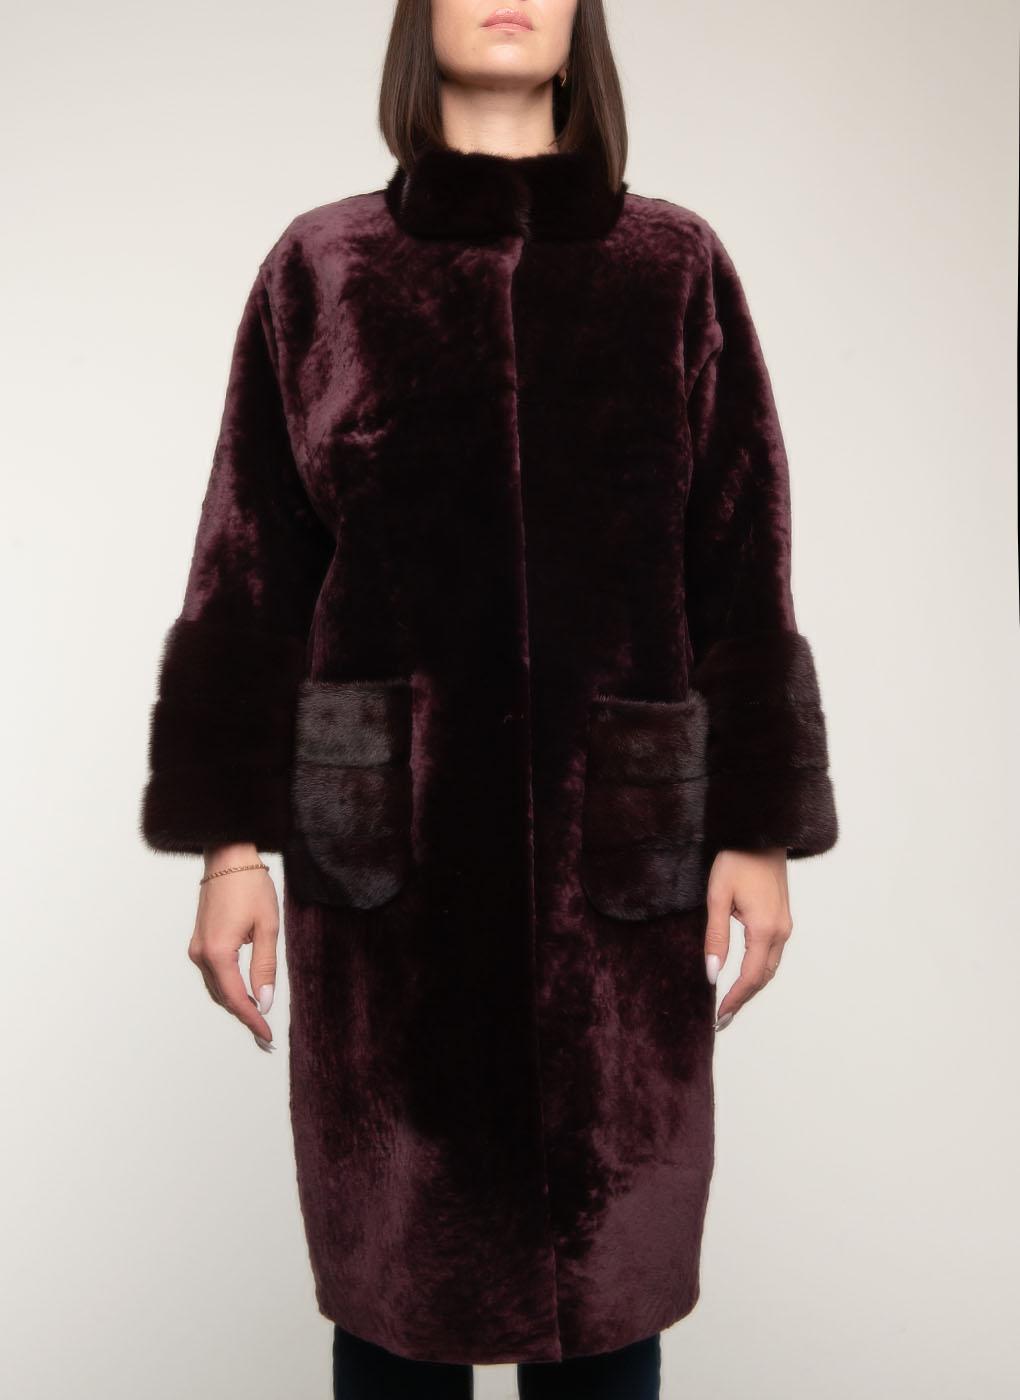 Пальто кокон из овчины 04, Aliance fur фото